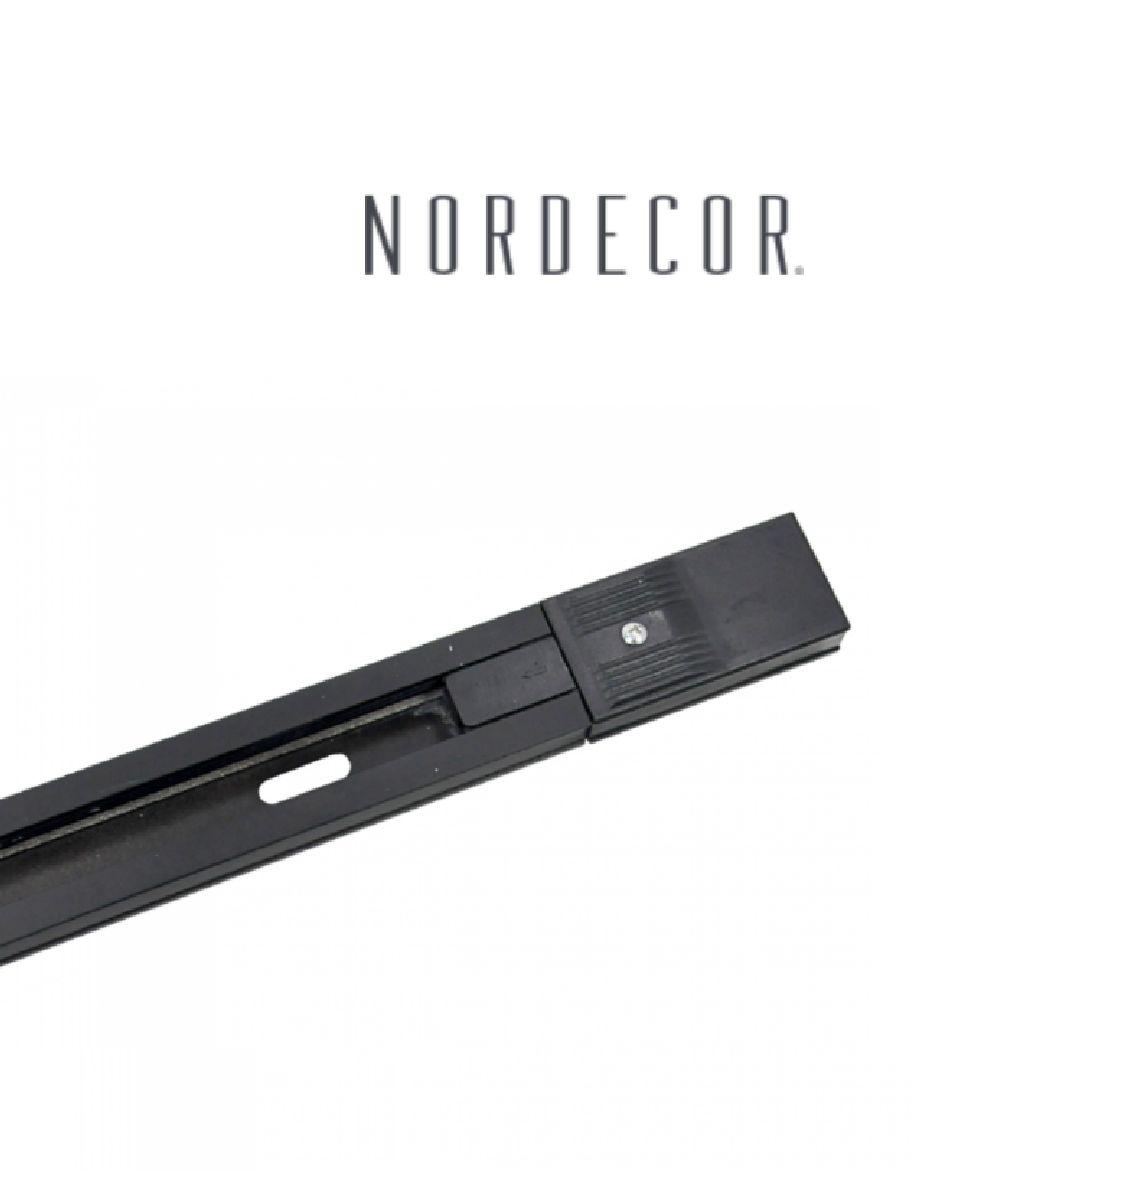 Kit Trilho Eletrificado 1m Preto Nordecor + 3 Spot Redondo MR16 / GU10 Para Sala Quarto Cozinha Quadro